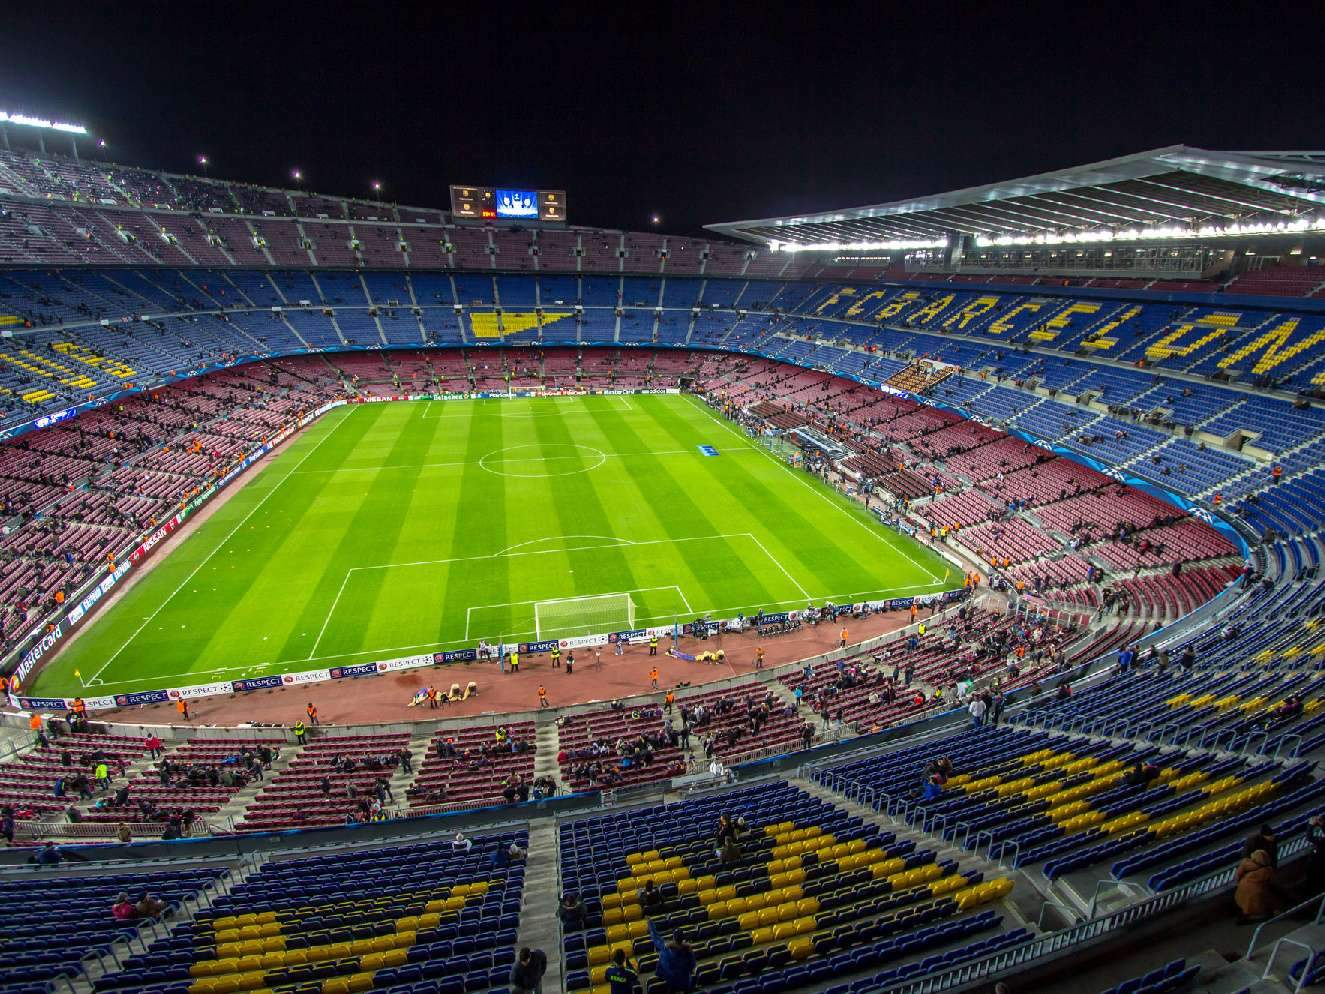 Брайтвайт не намерен покидать «Барселону»